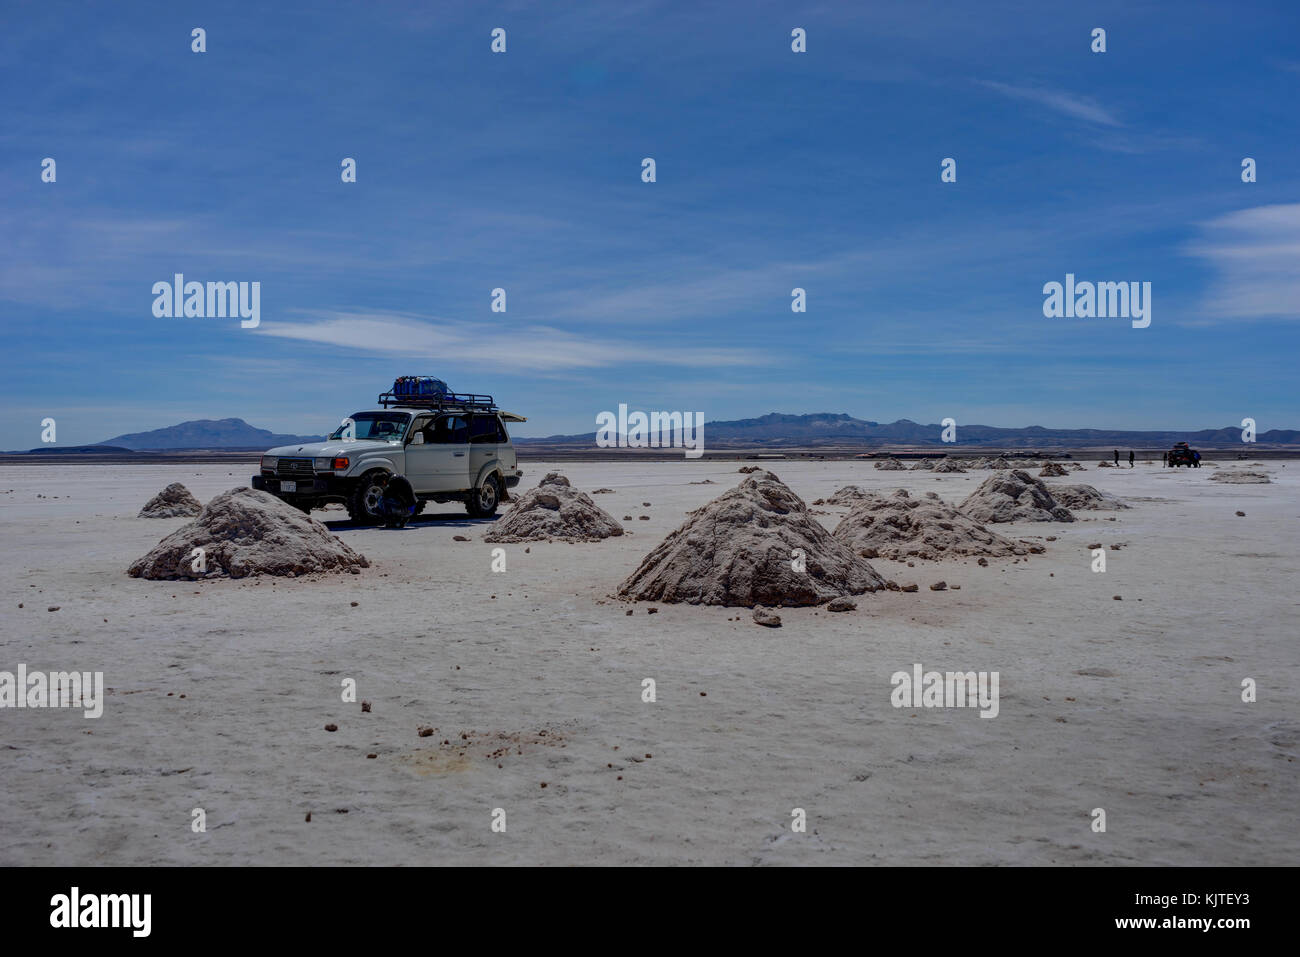 Photo taken in August 2017 in Uyuni Bolivia, South America: Jeep Tour Salt Flats in Salar de Uyuni Desert Bolivia. - Stock Image